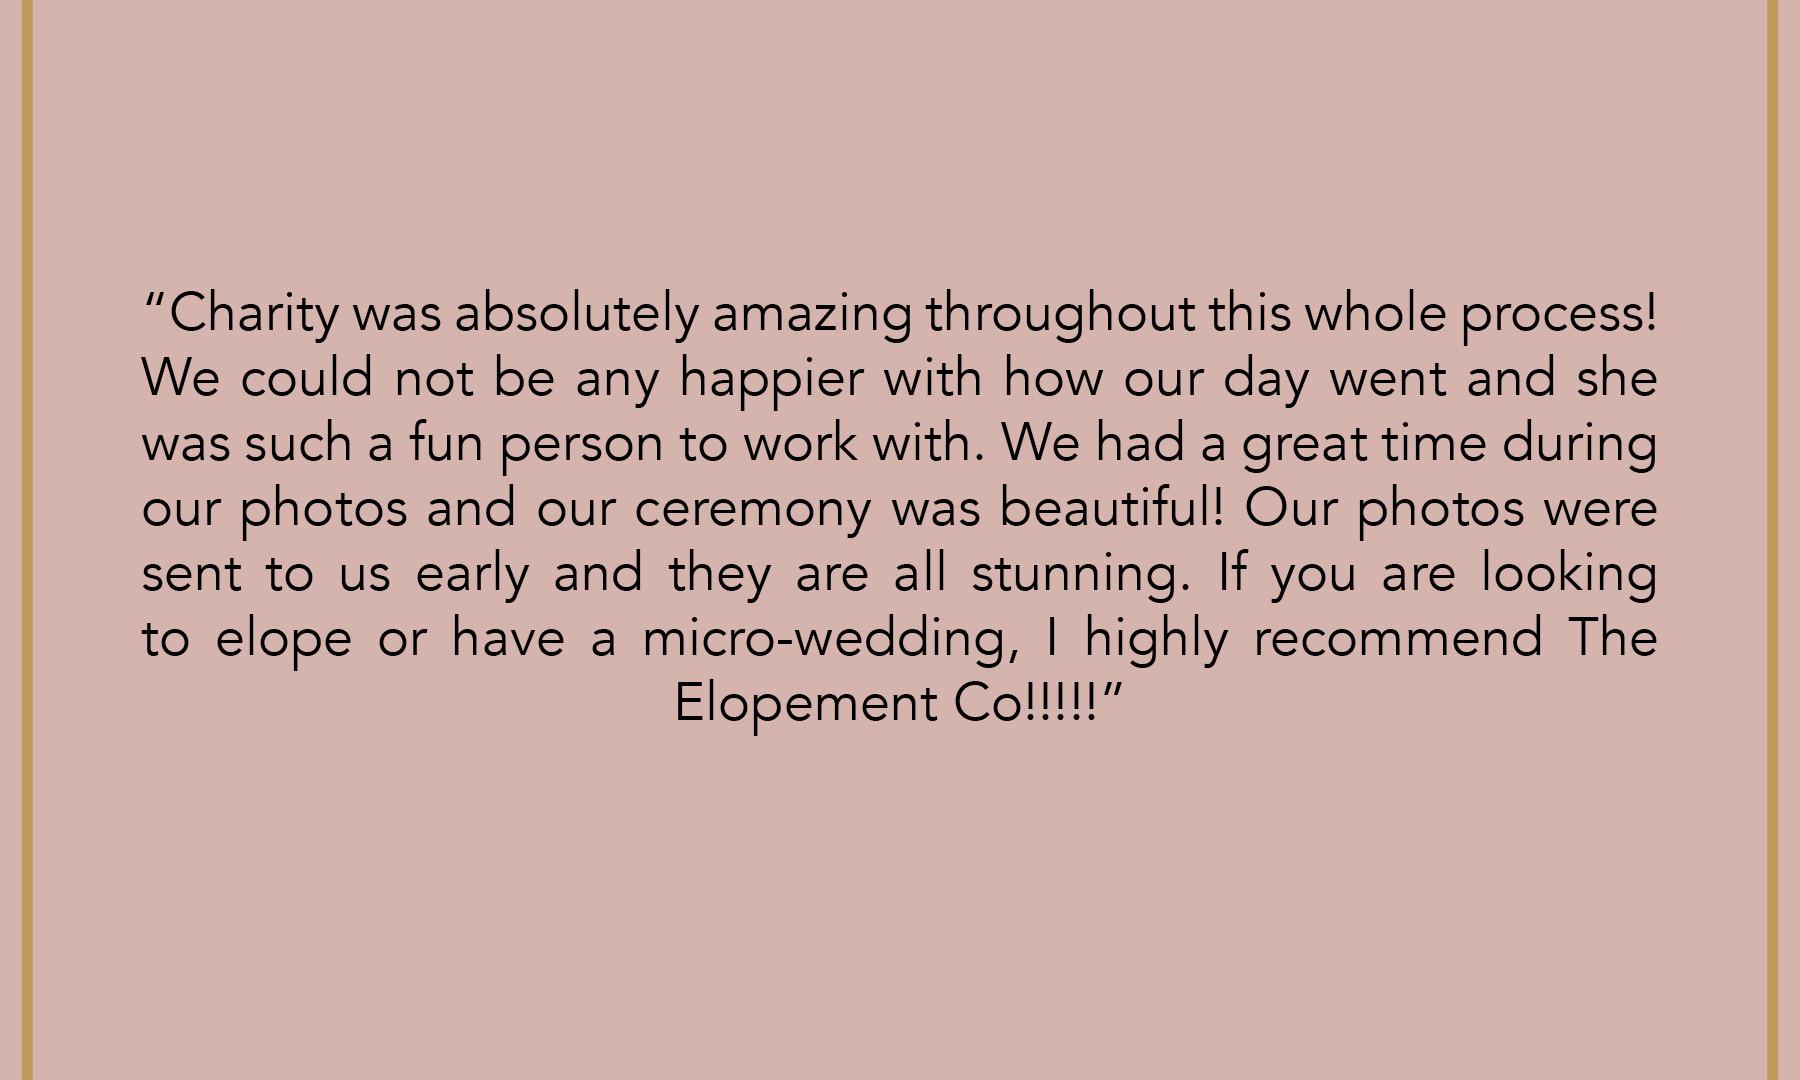 The Elopement Co. Reviews